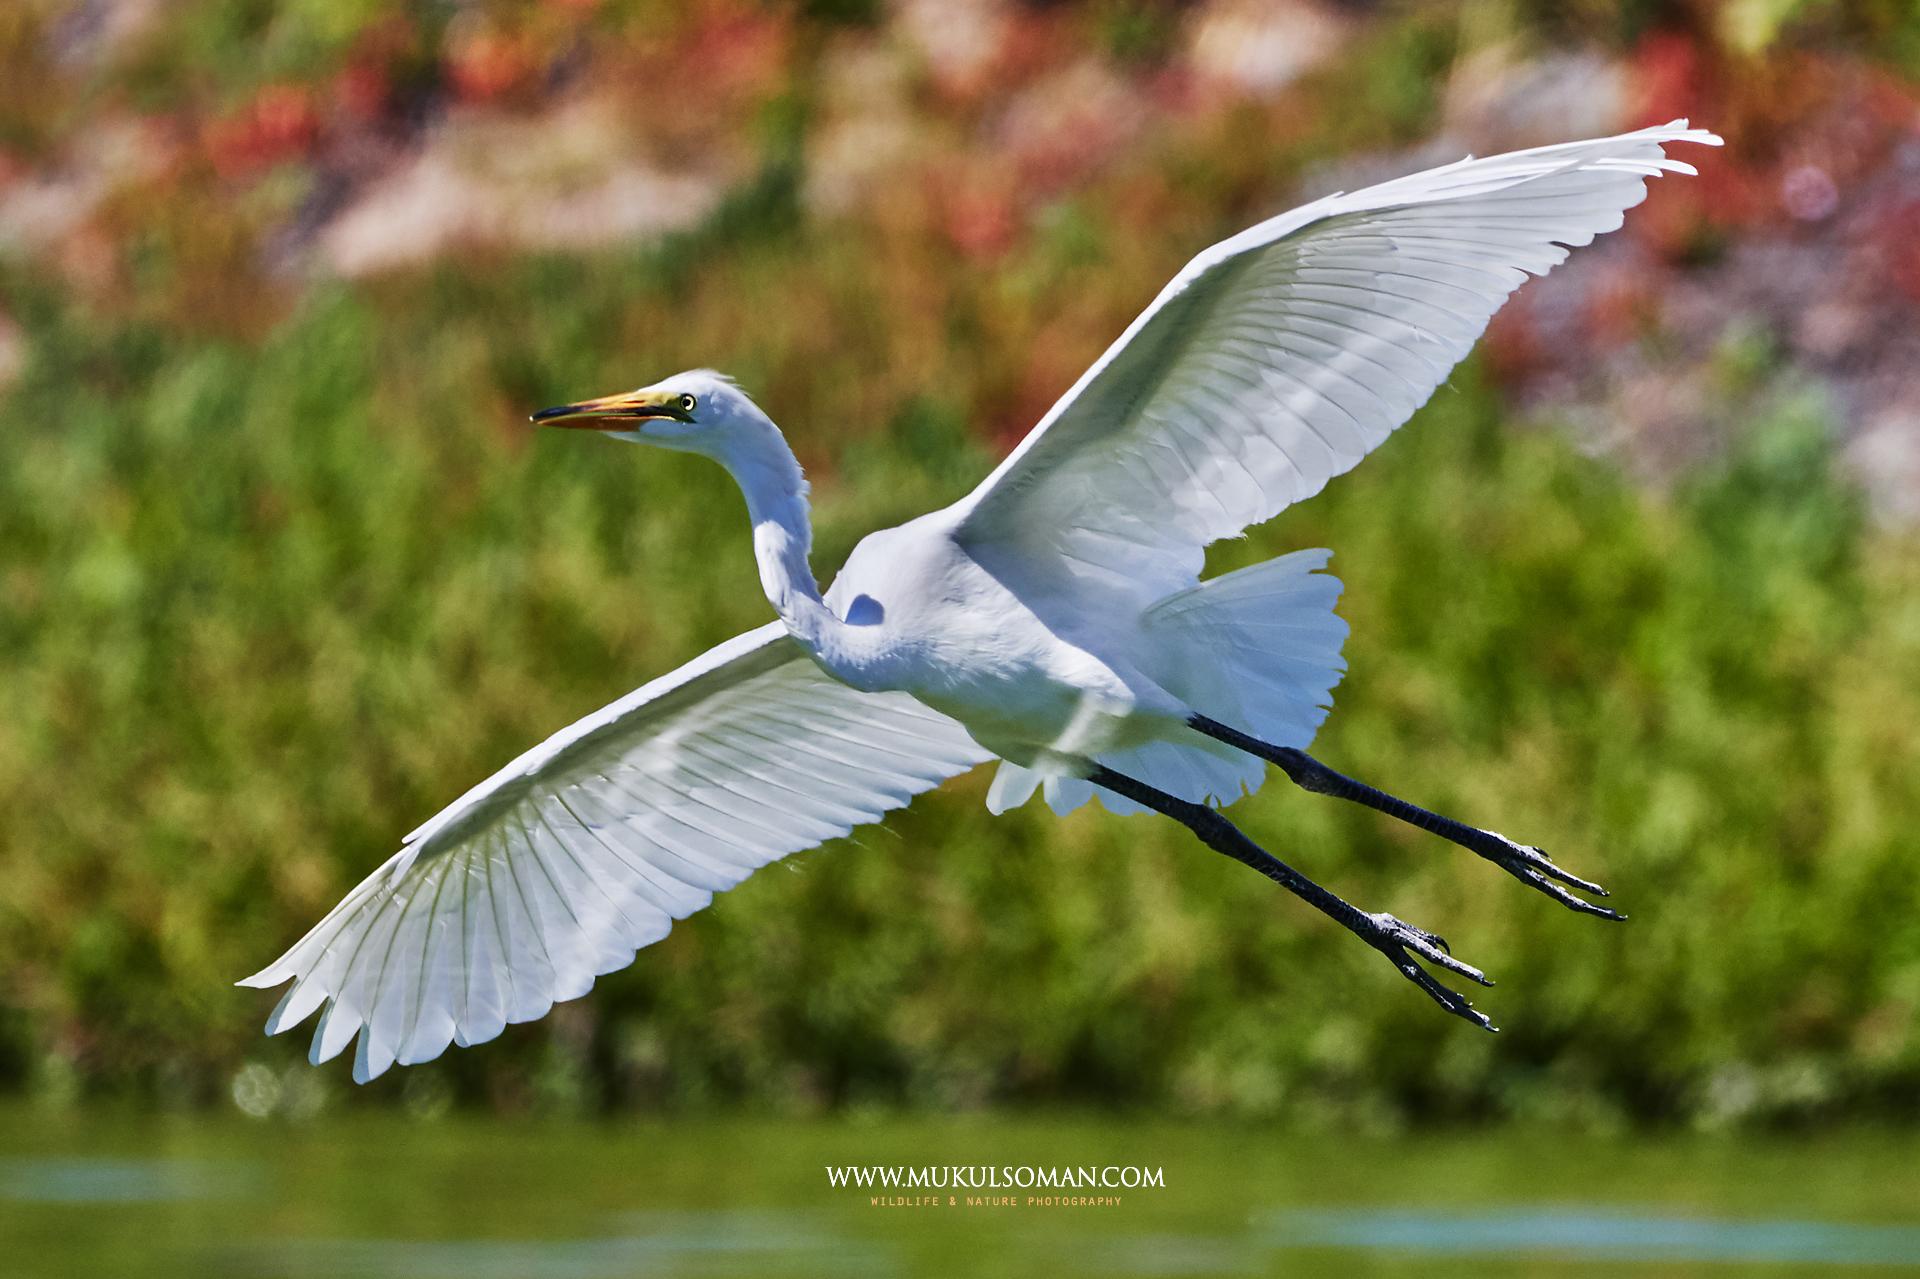 Great Egret in flight.  Camera : Nikon D500 | Focal Length : 600mm |Exposure : 1/2000 | Aperture : f/6.3 |ISO : 400